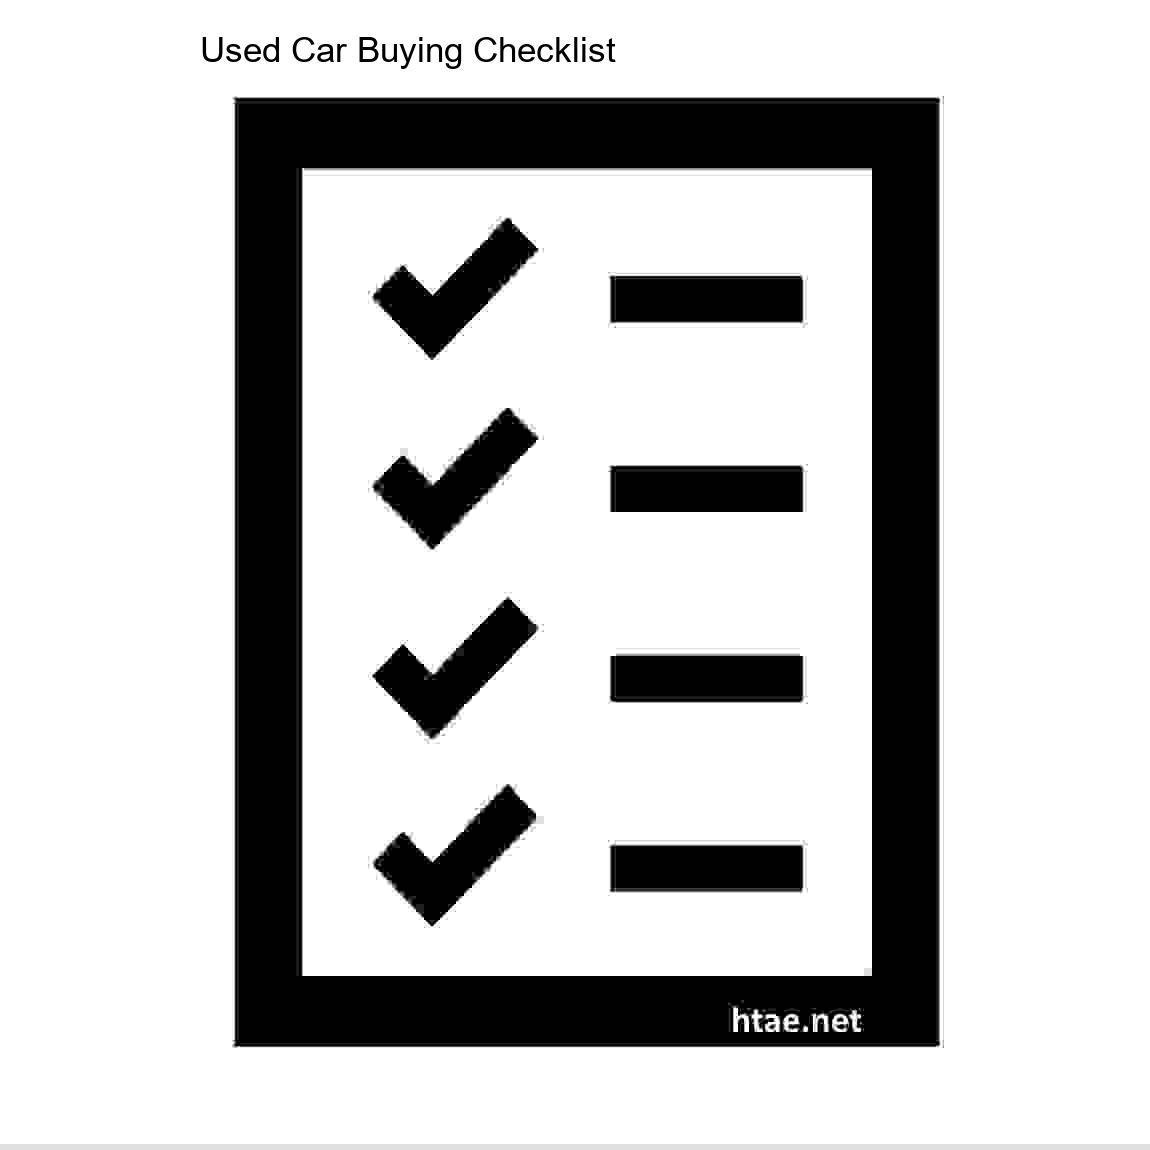 Used Car Buying Checklist General To Do Checklist